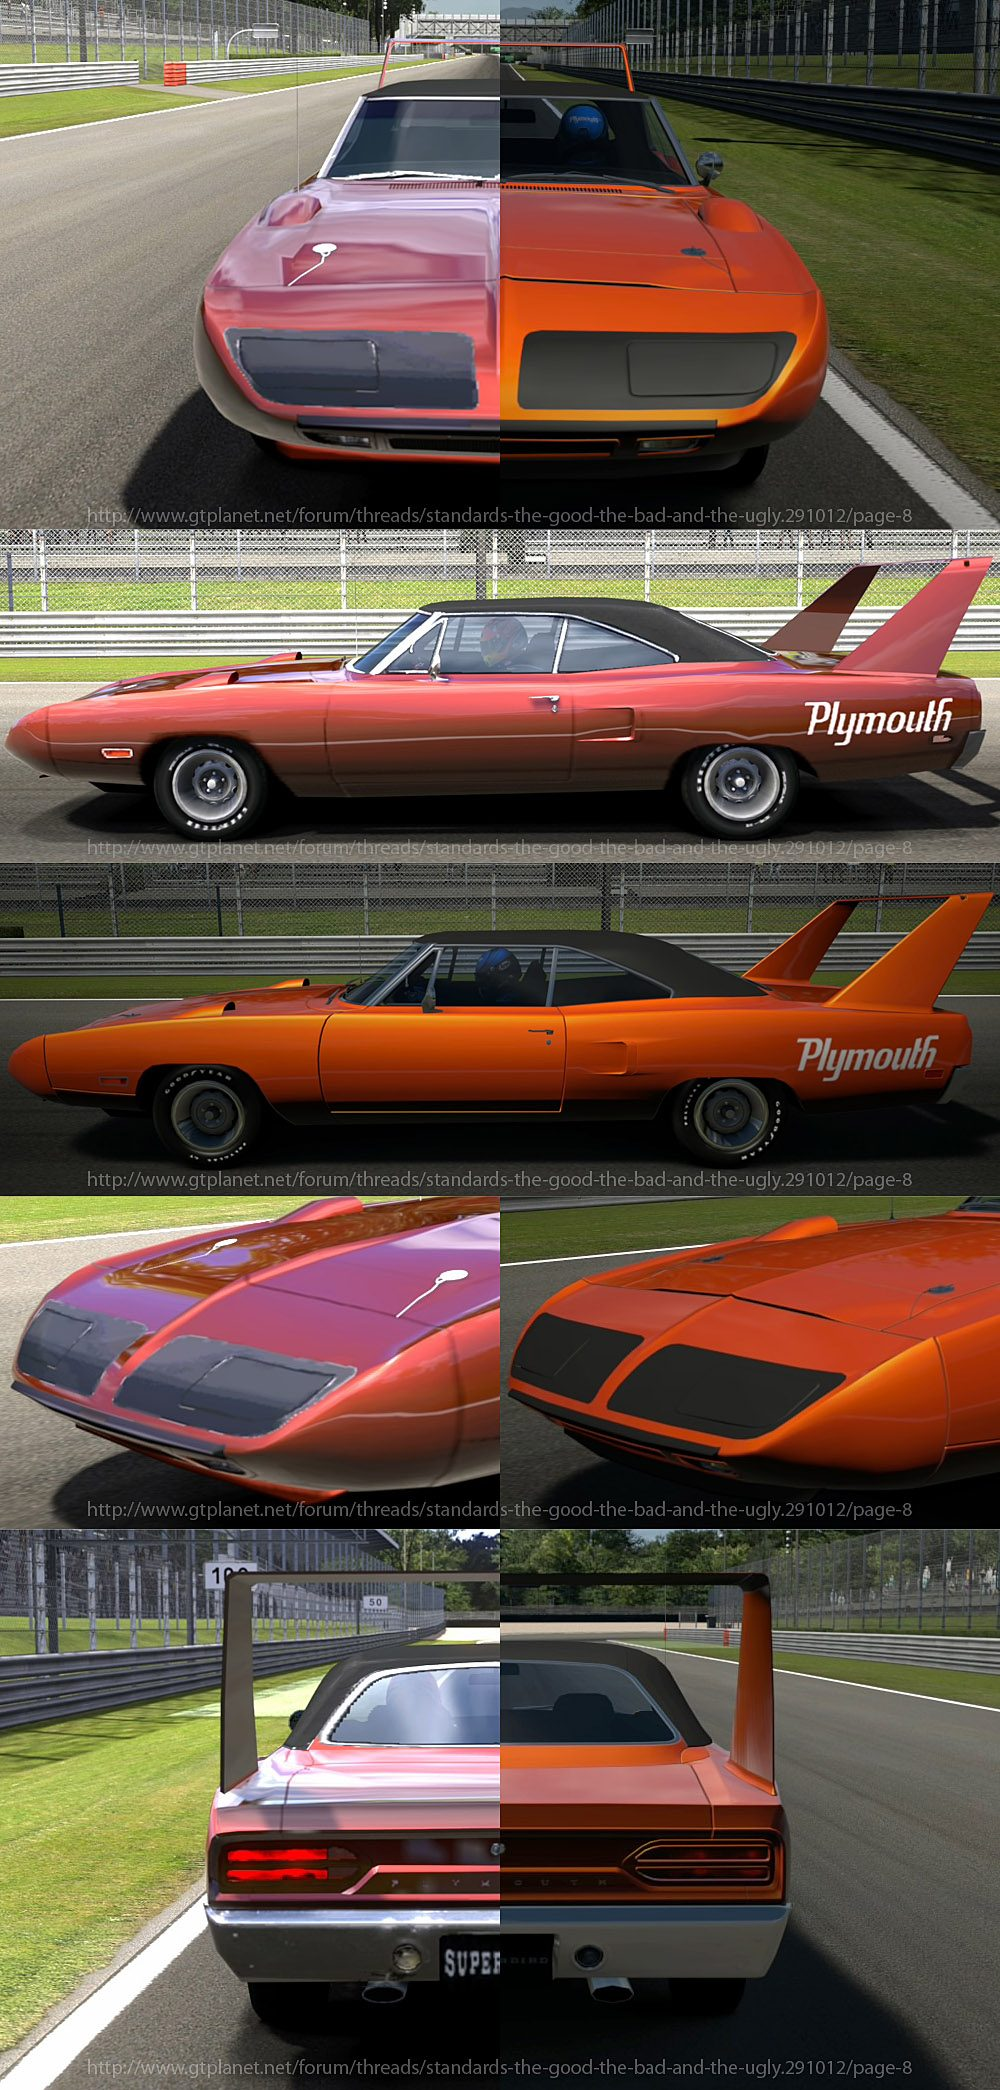 Superbird_s011.jpg